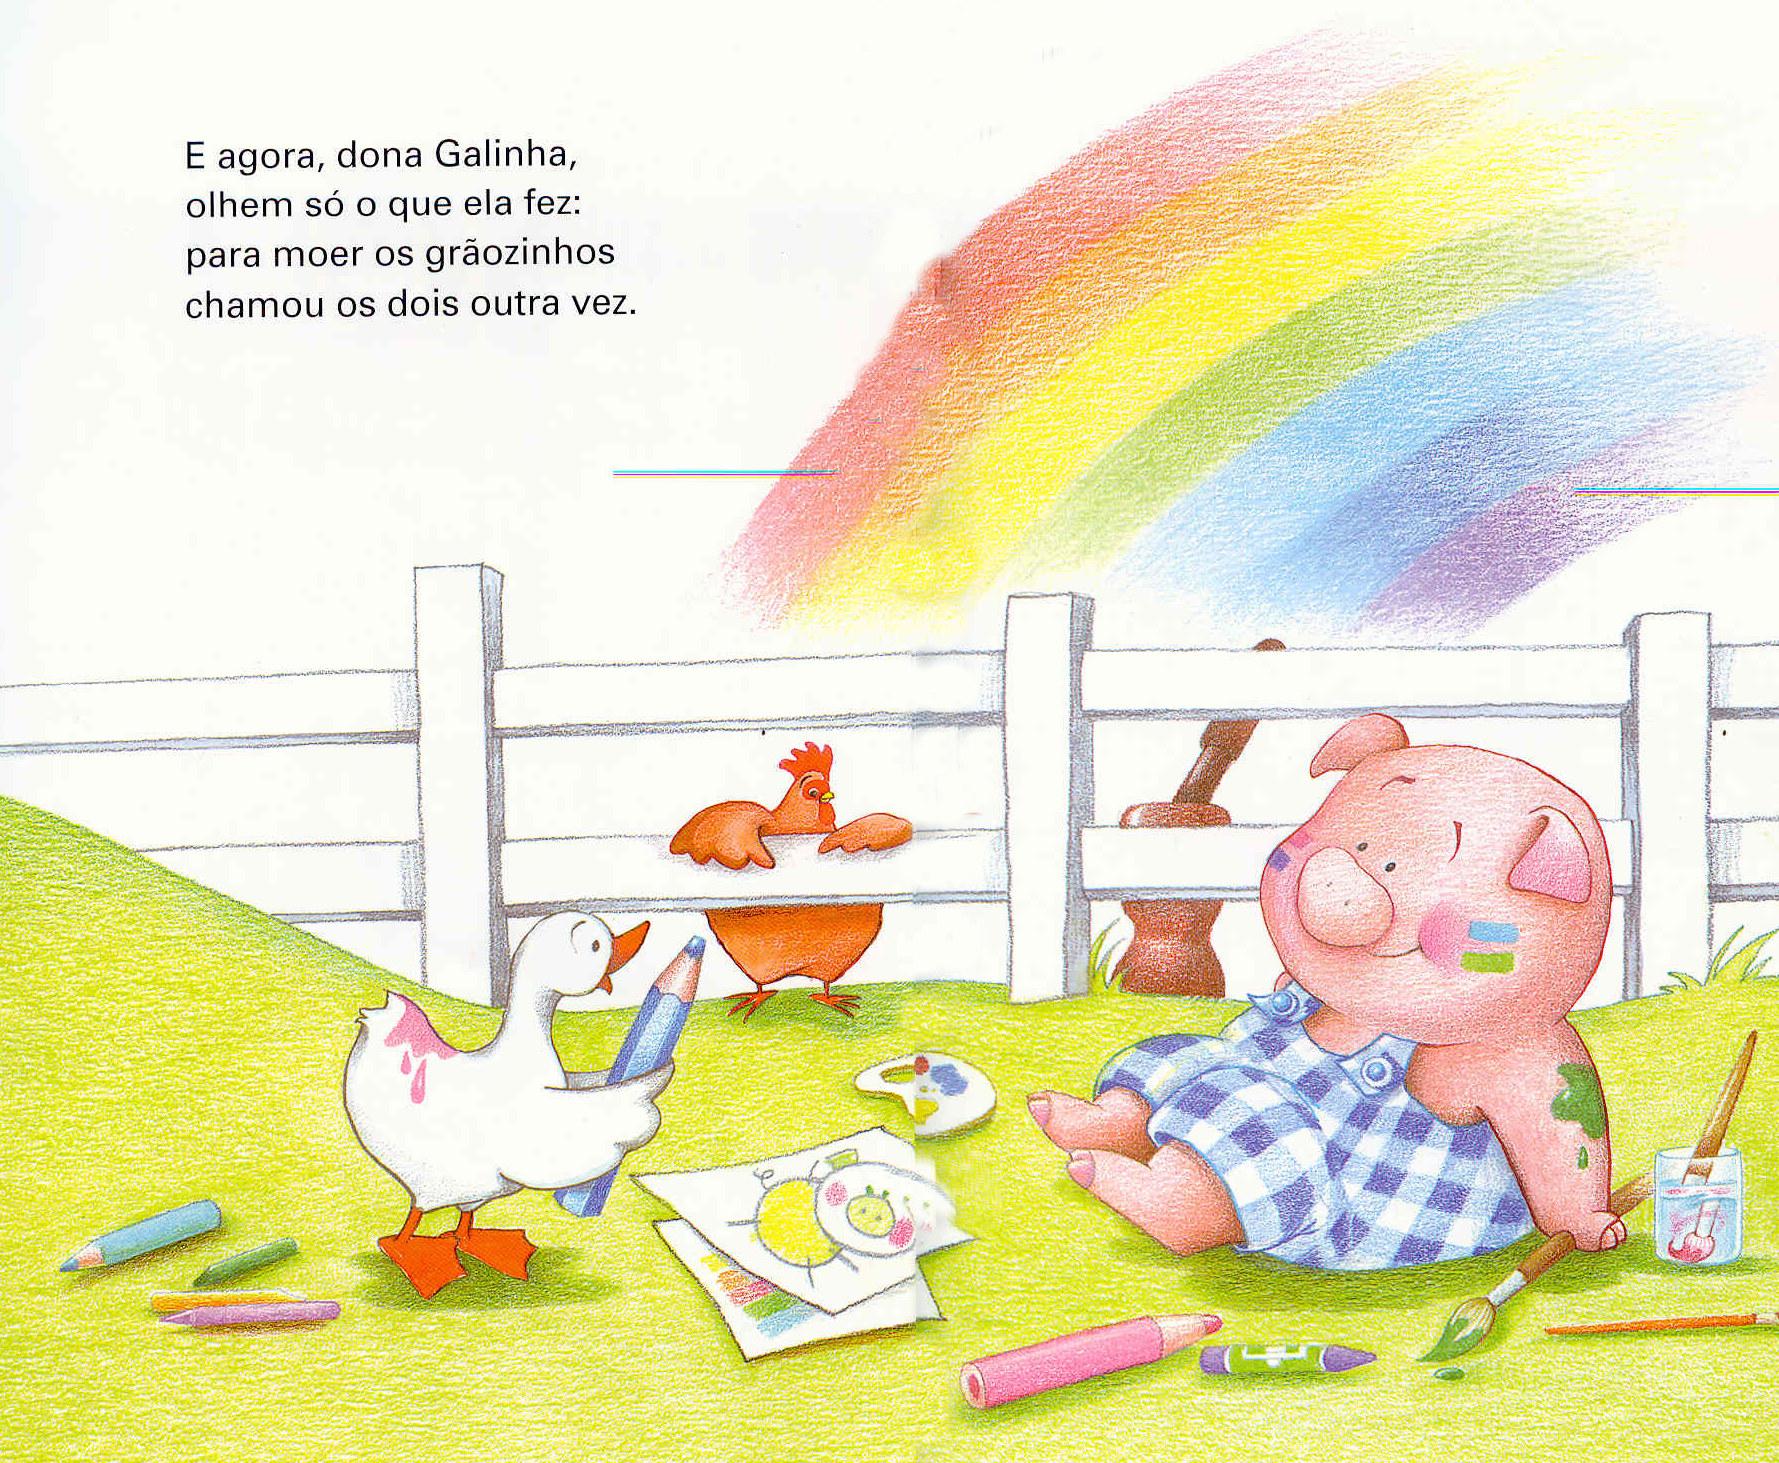 lIivro A galinha ruiva-13-14